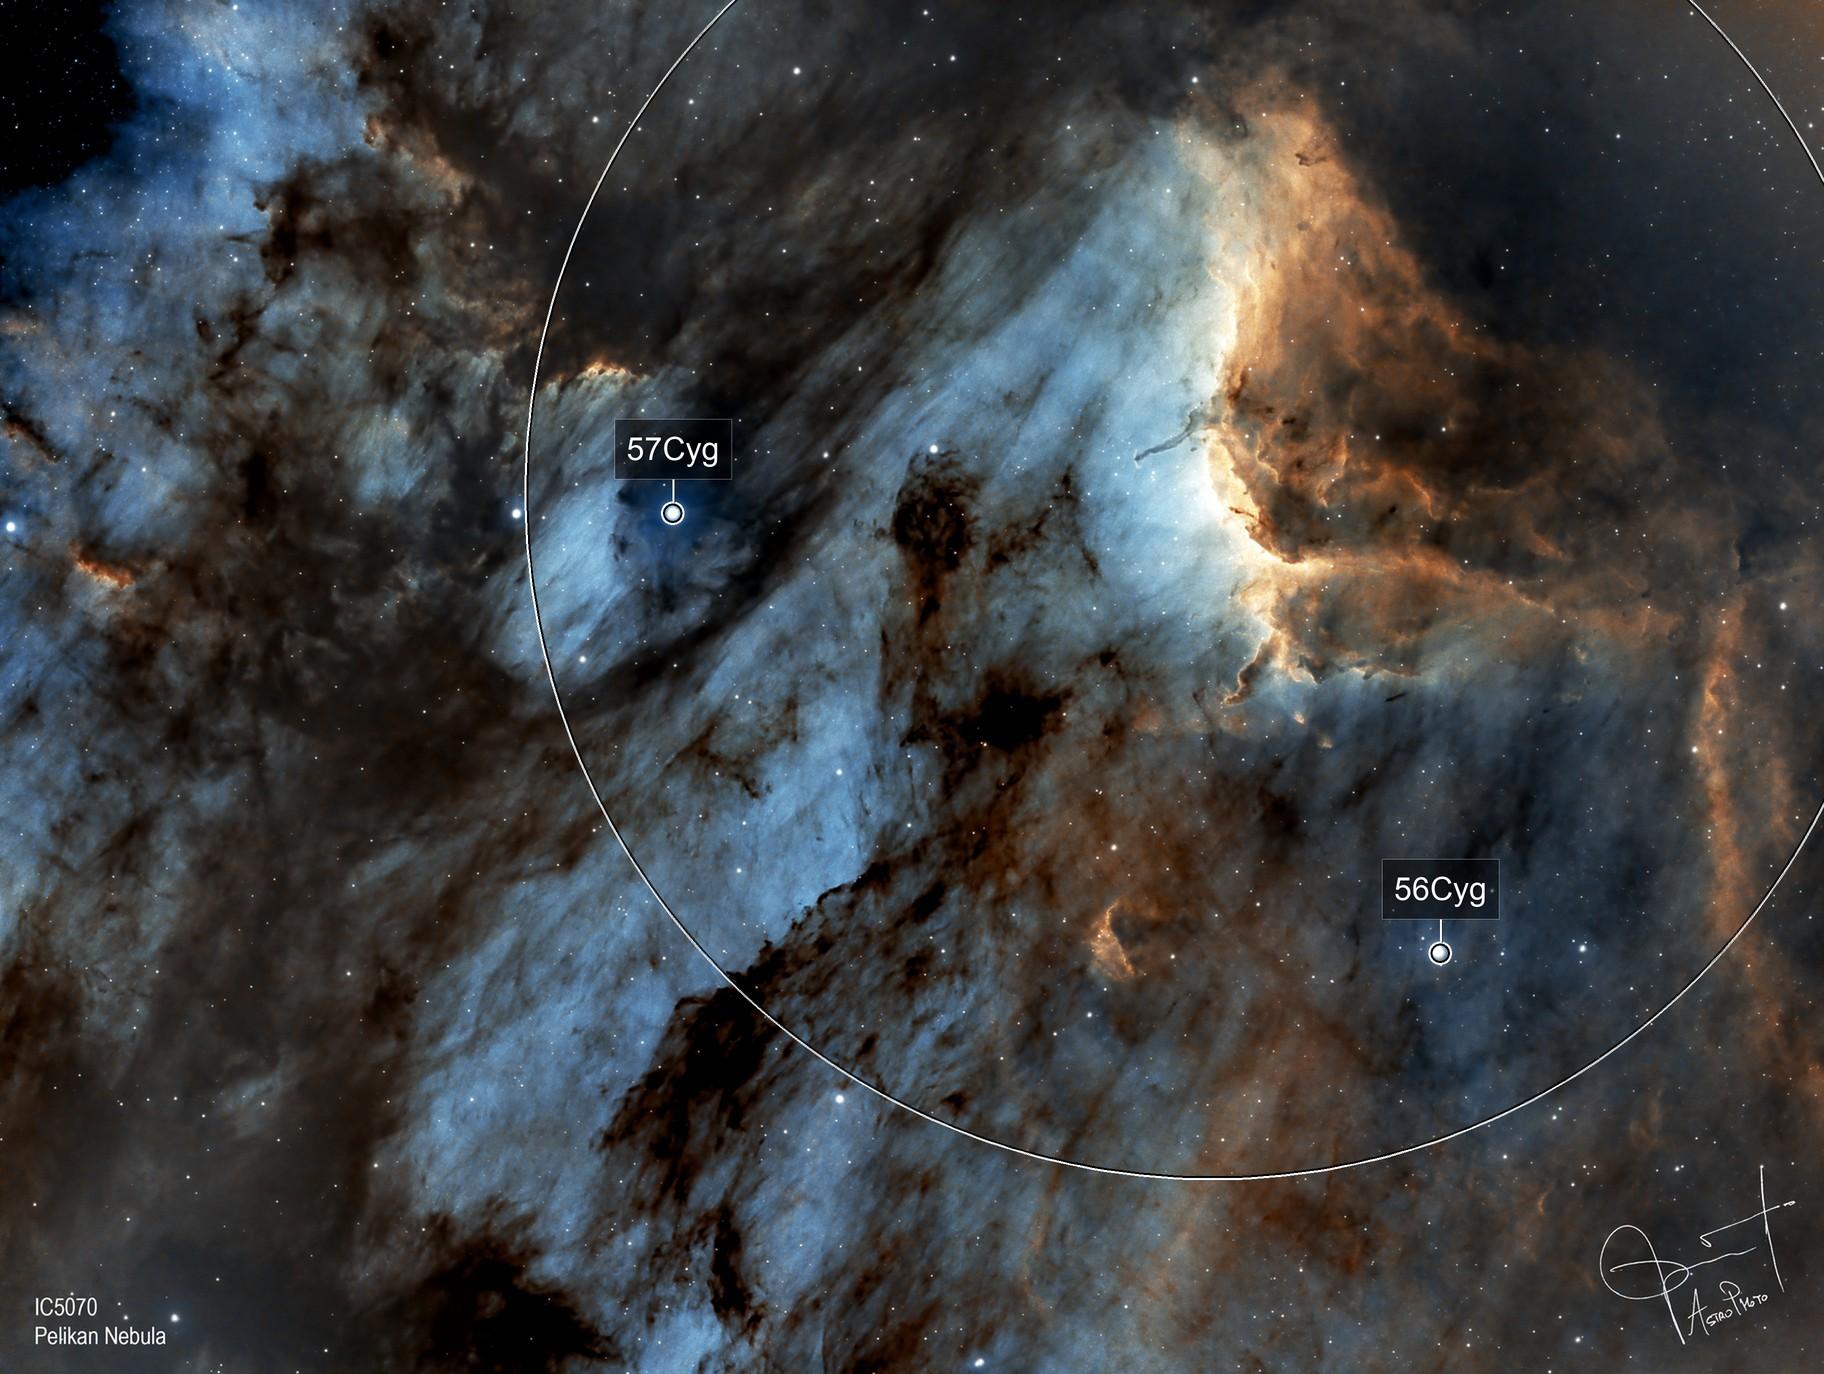 Pelikan Nebula in SHO